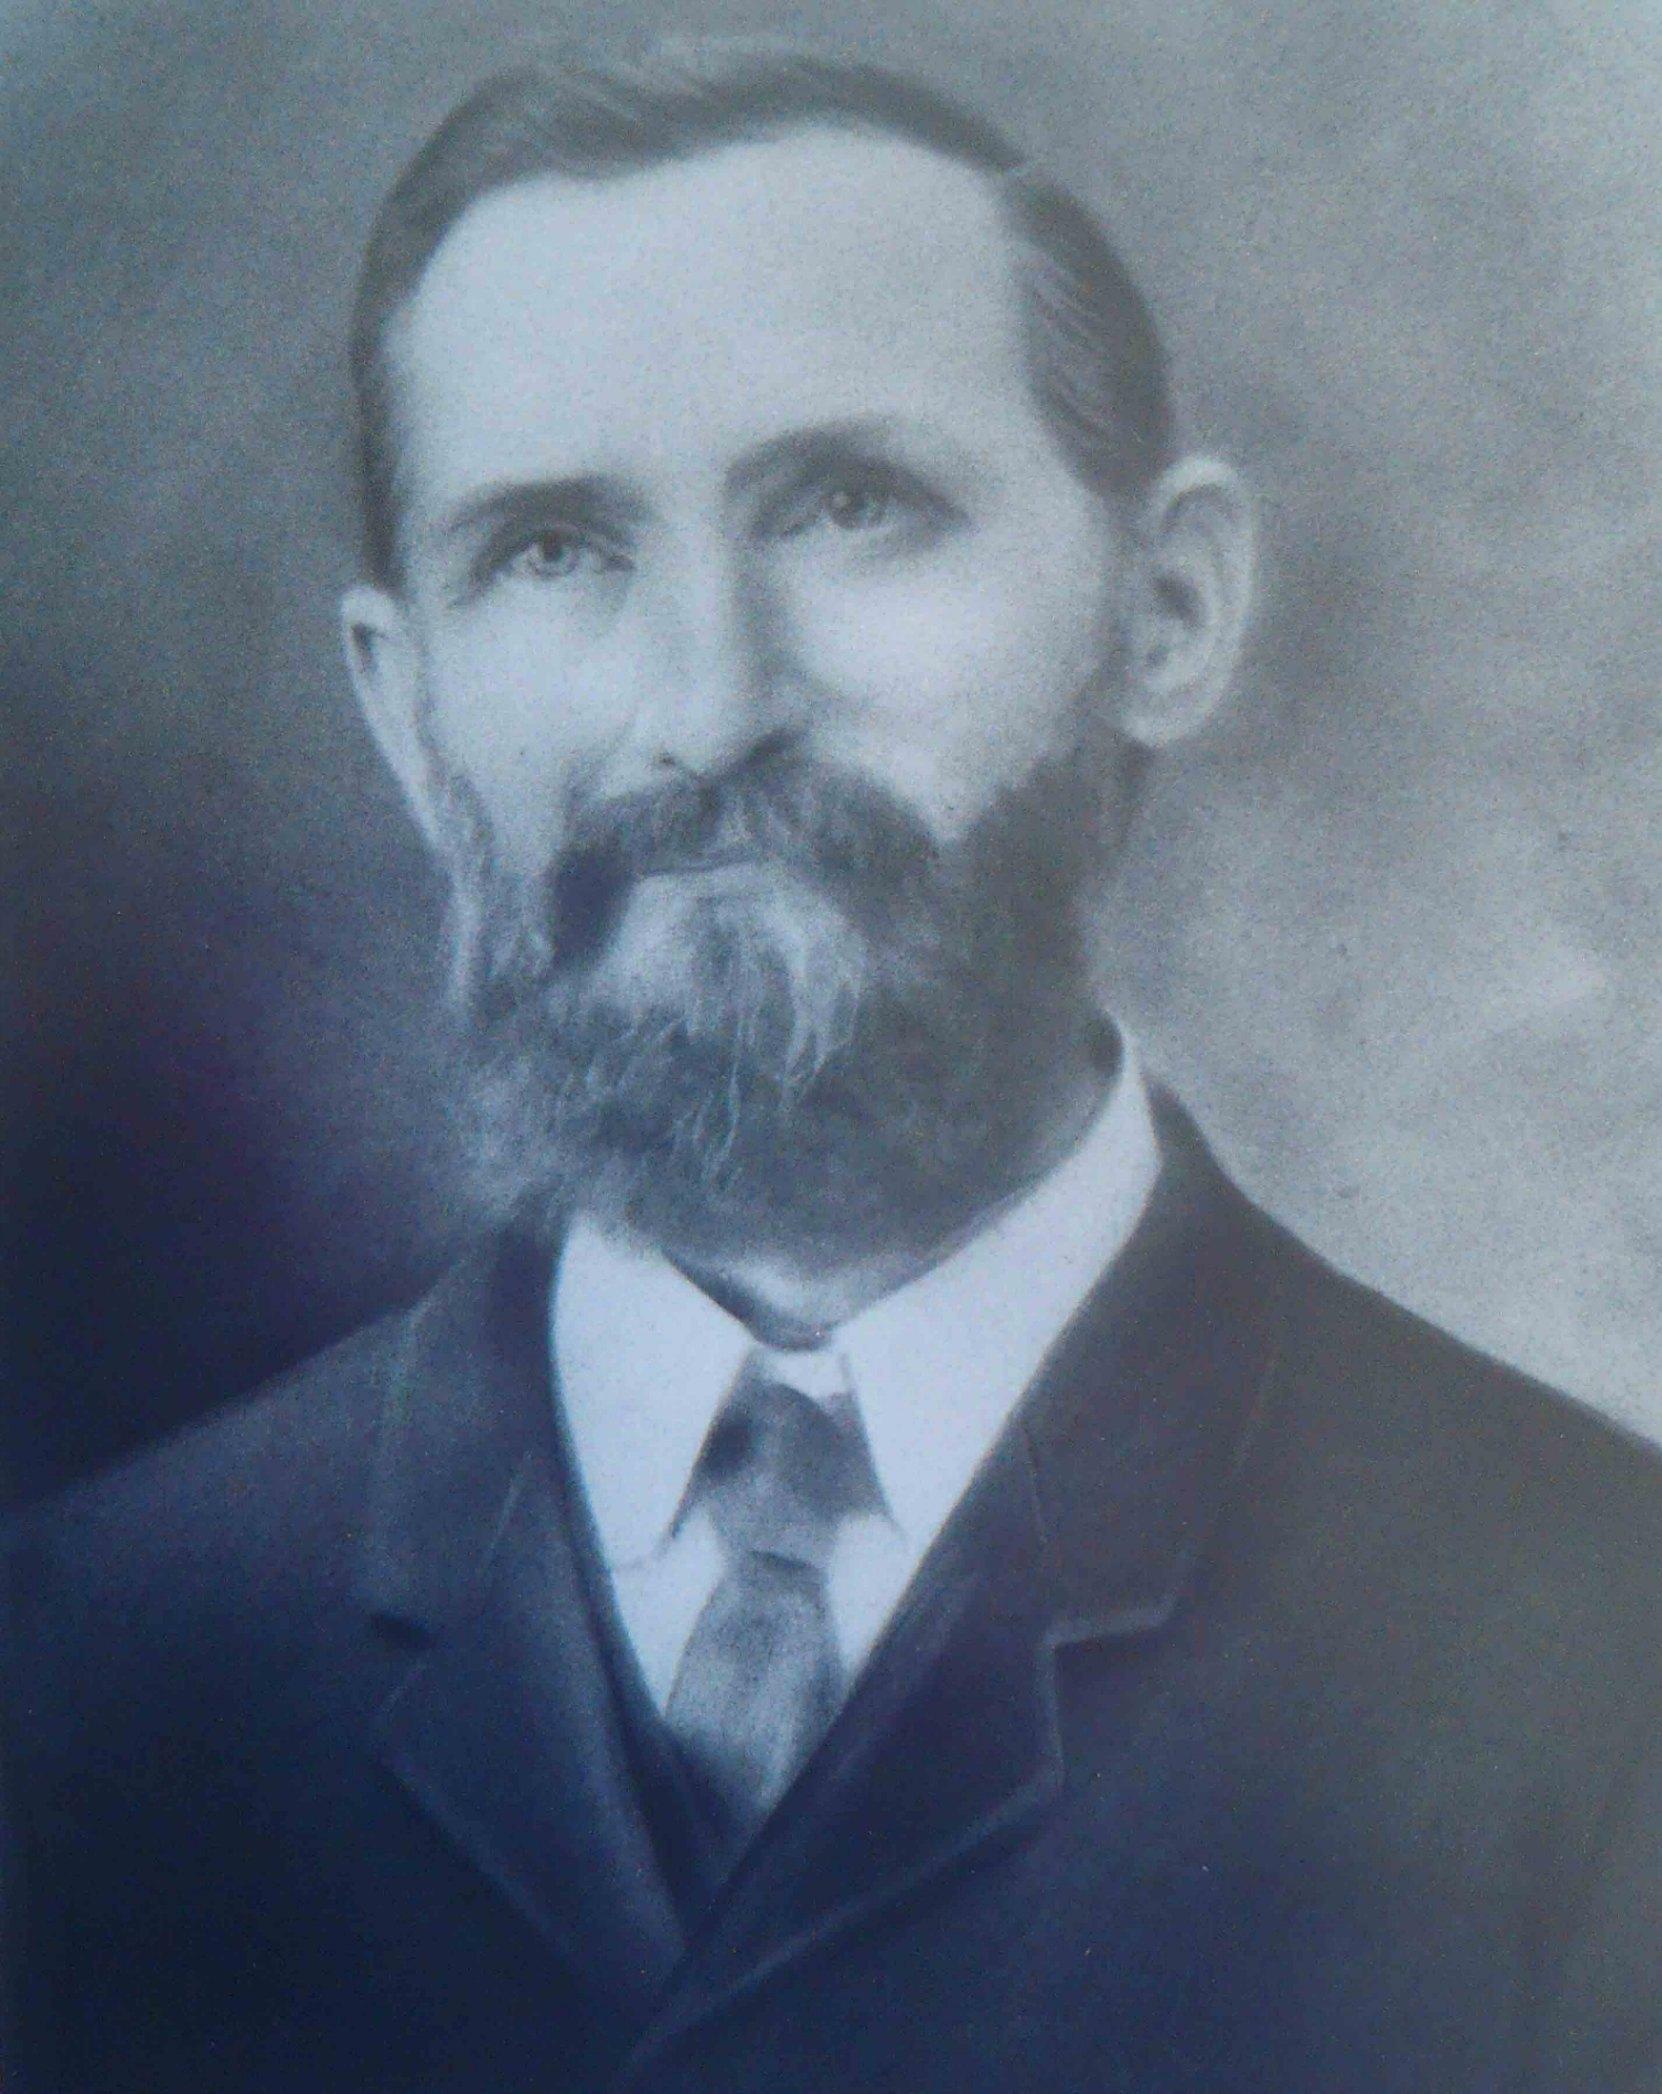 John Henry Peterson, circa 1914